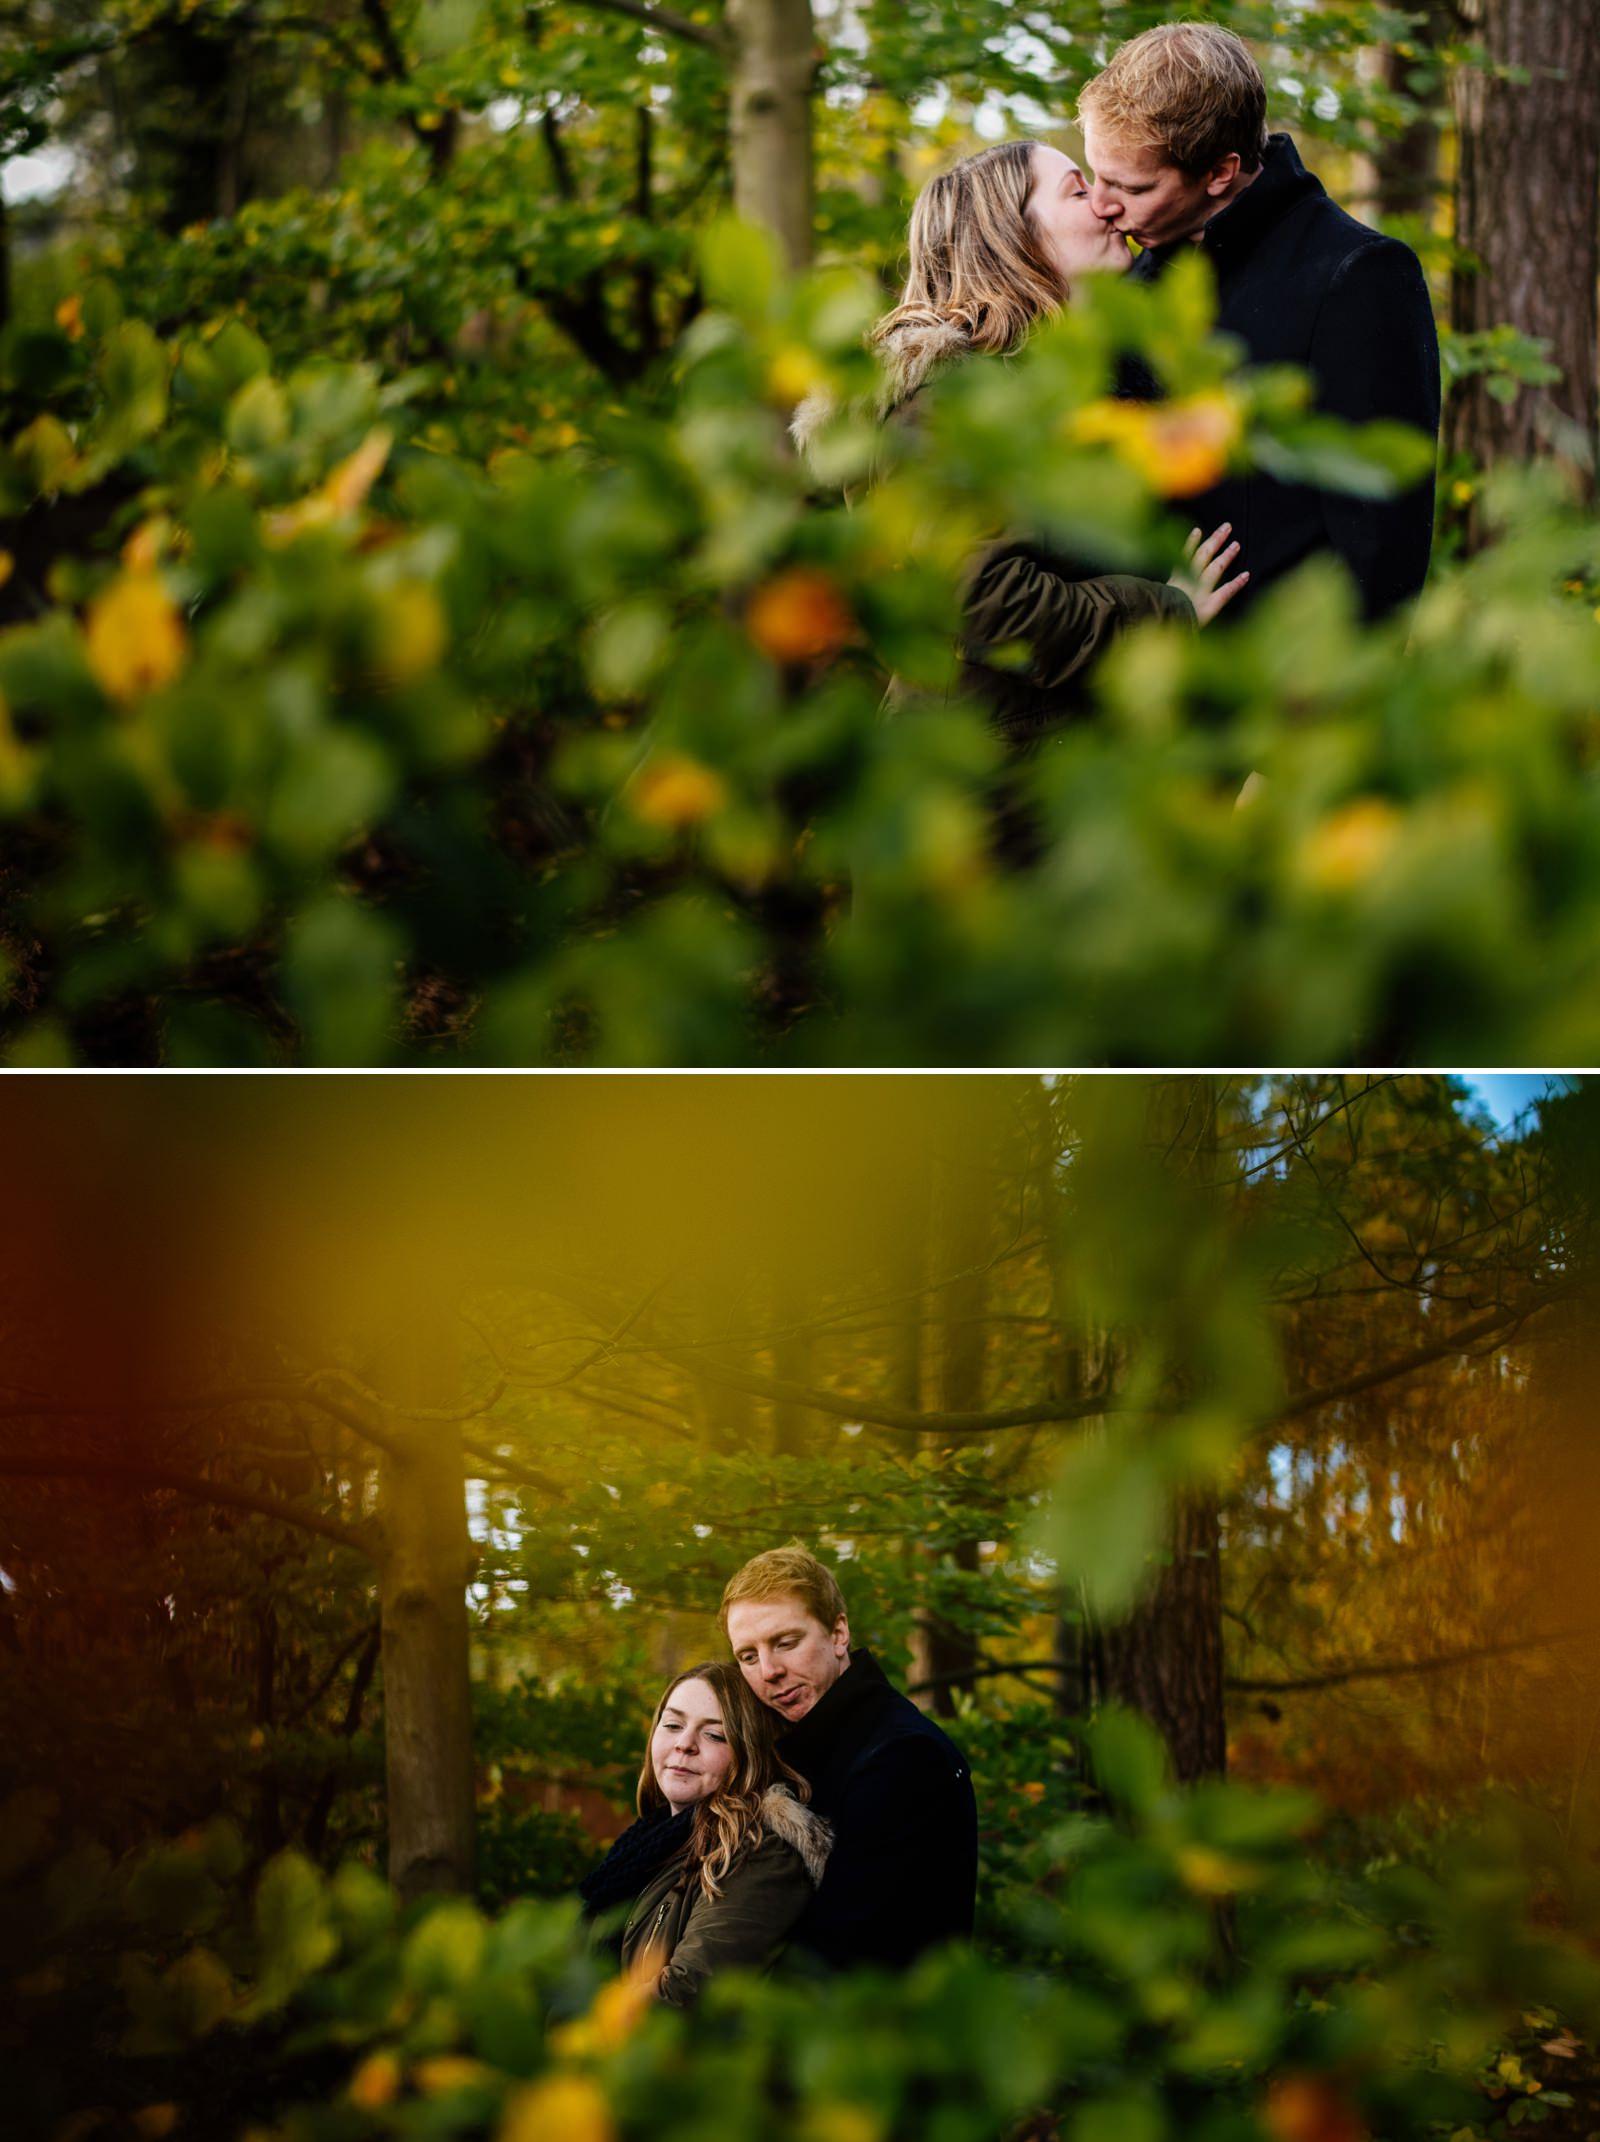 Nicola & Dan - Harlestone Firs Pre-Wedding Shoot_0004